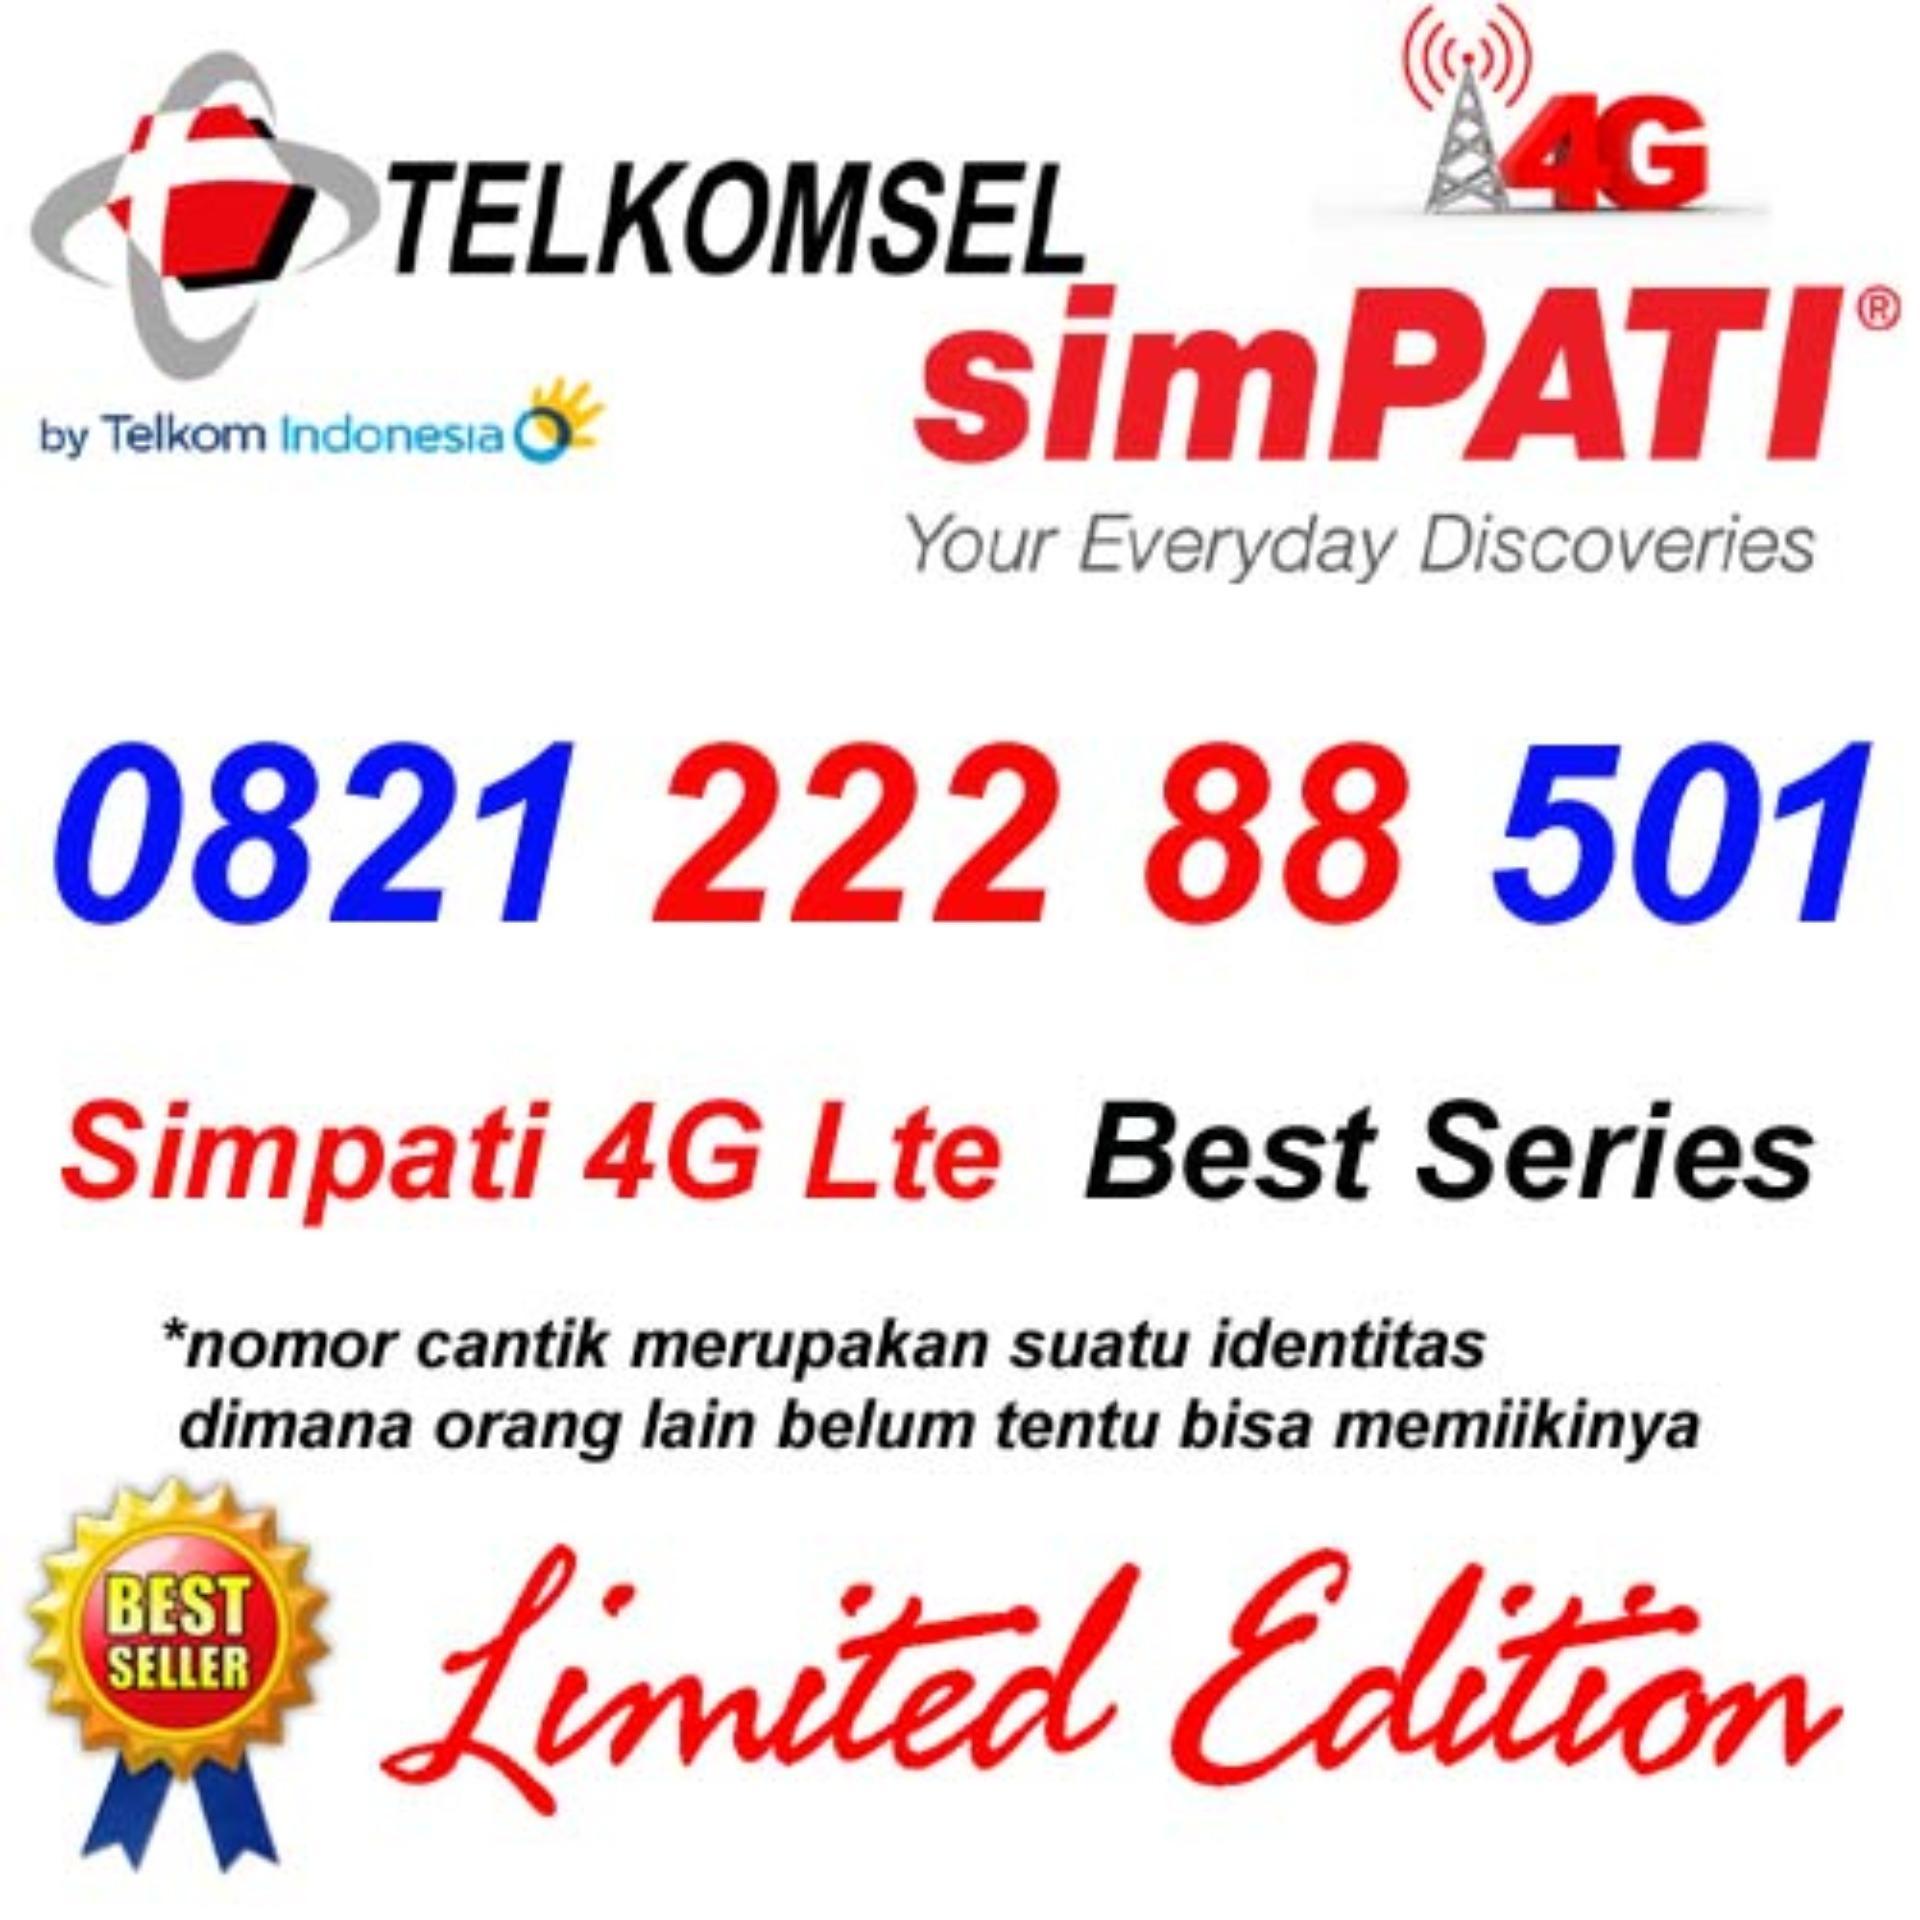 Telkomsel Simpati 4G Lte 0821 222 88 501 Kartu Perdana Nomor cantik